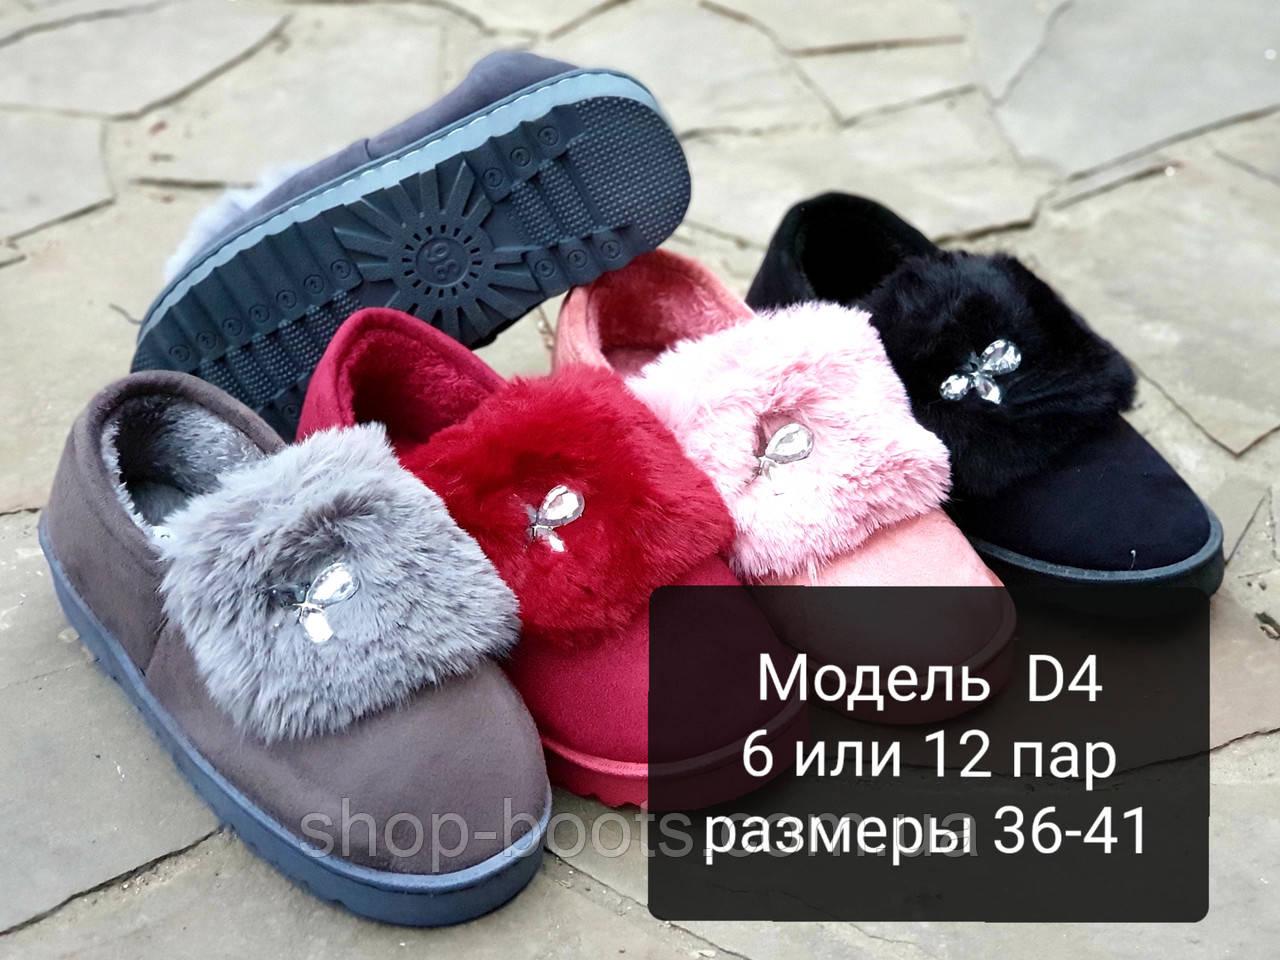 Женские тапочки оптом. 36-41рр. Модель тапочки D4